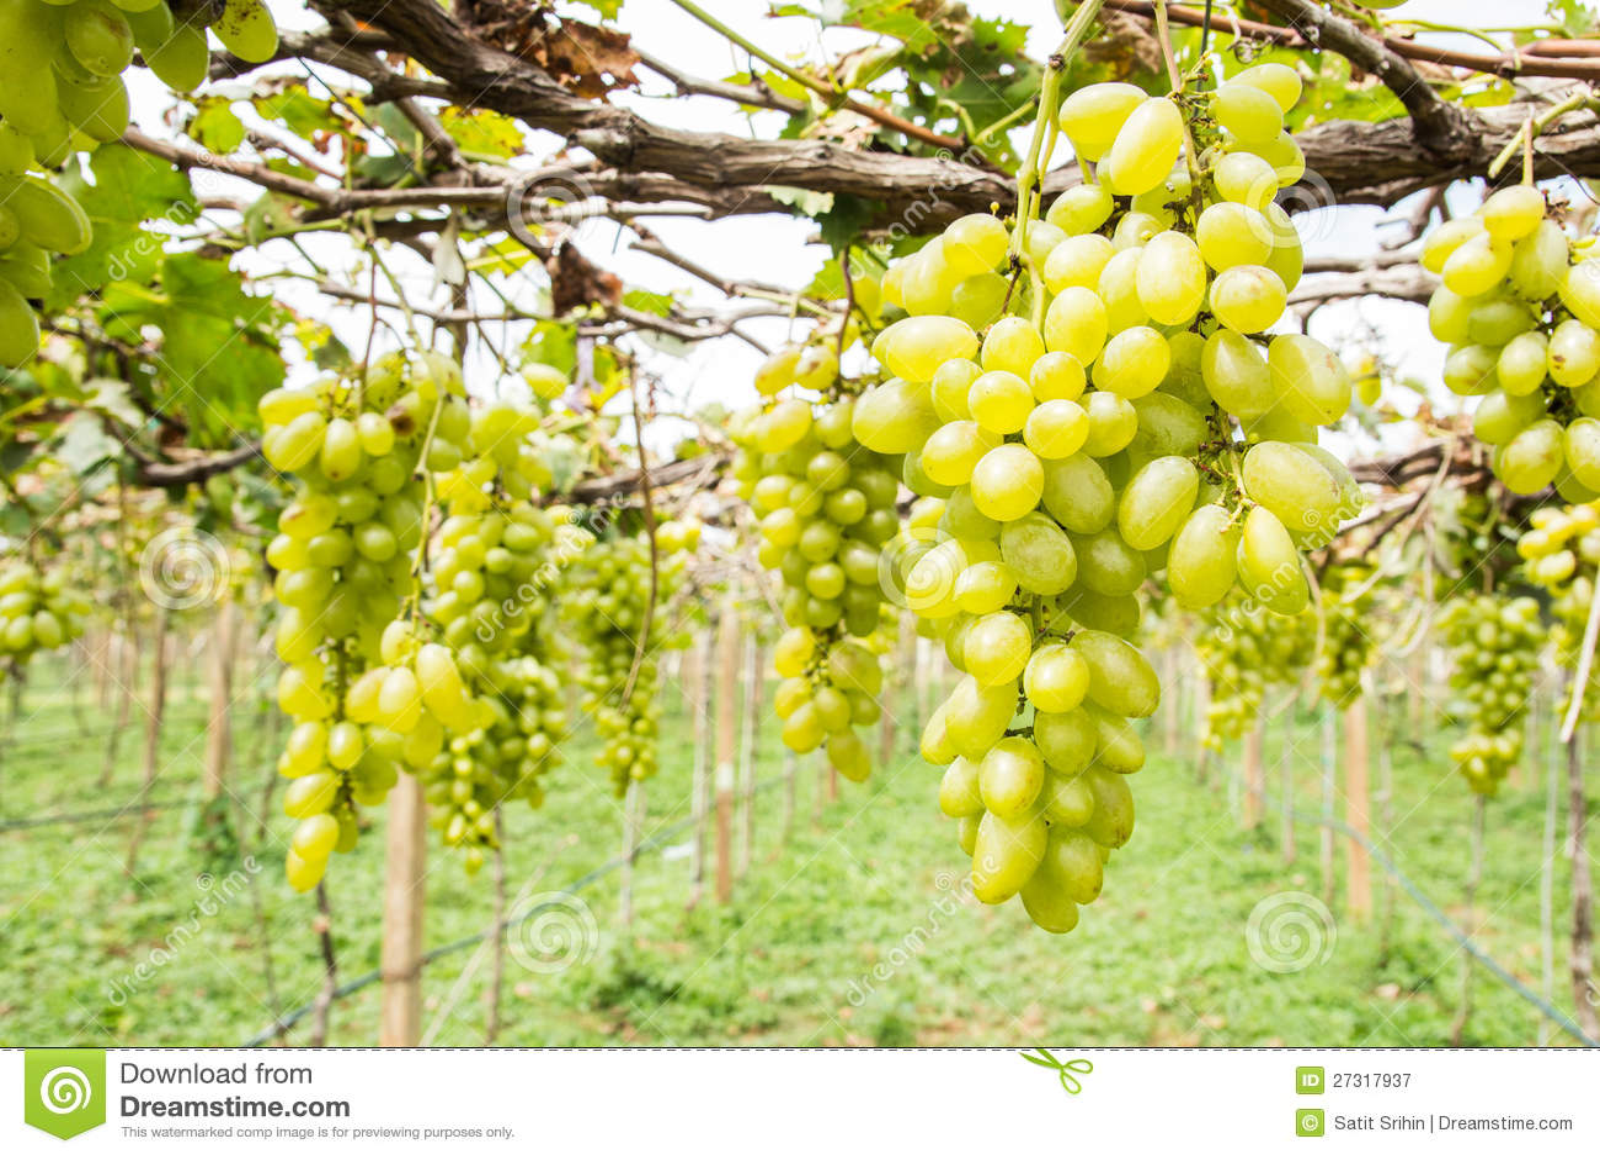 Groene druif op wijnstok